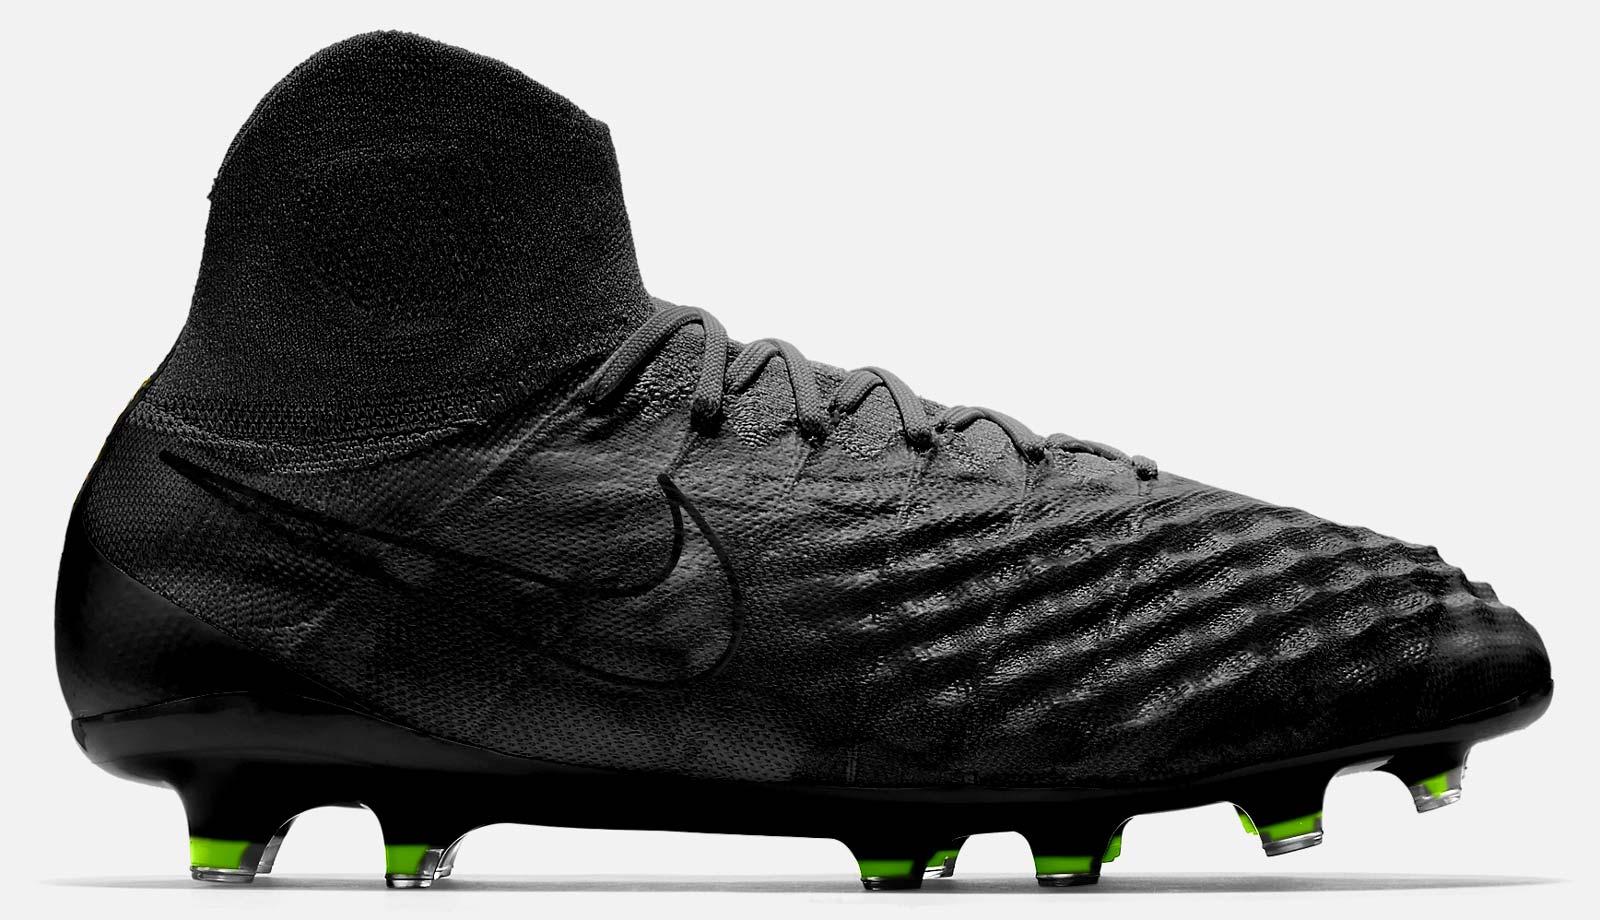 Nike Magista Obra 2 Black